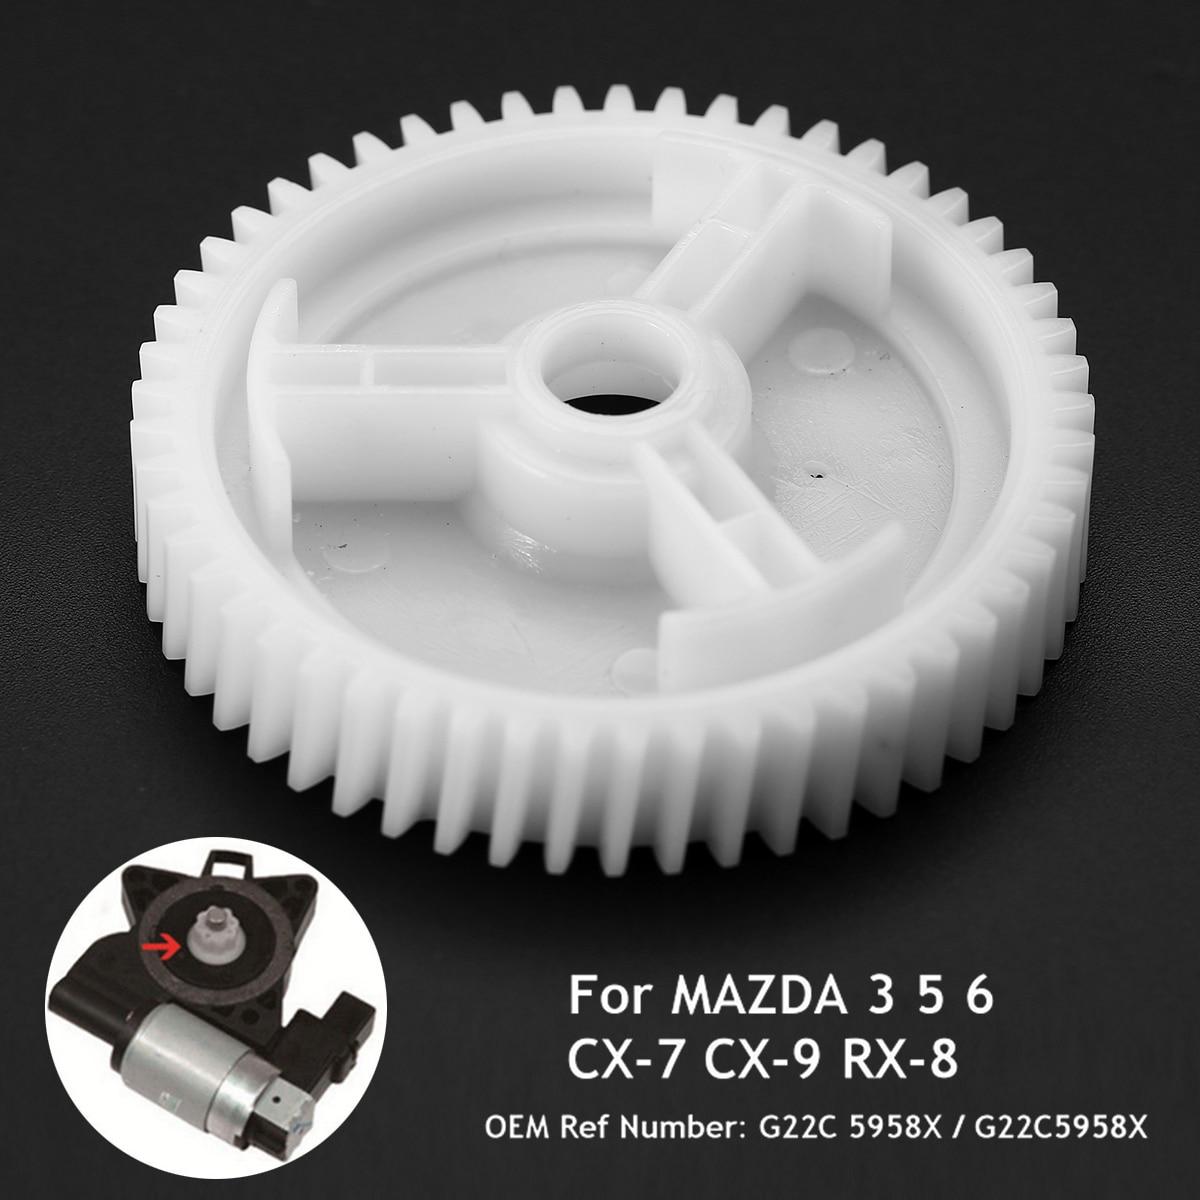 Mayitr 1pc 전면 전원 레귤레이터 창 모터 기어 교체 G22C5958X 마즈다 3 5 6 CX-7 CX-9 RX-8